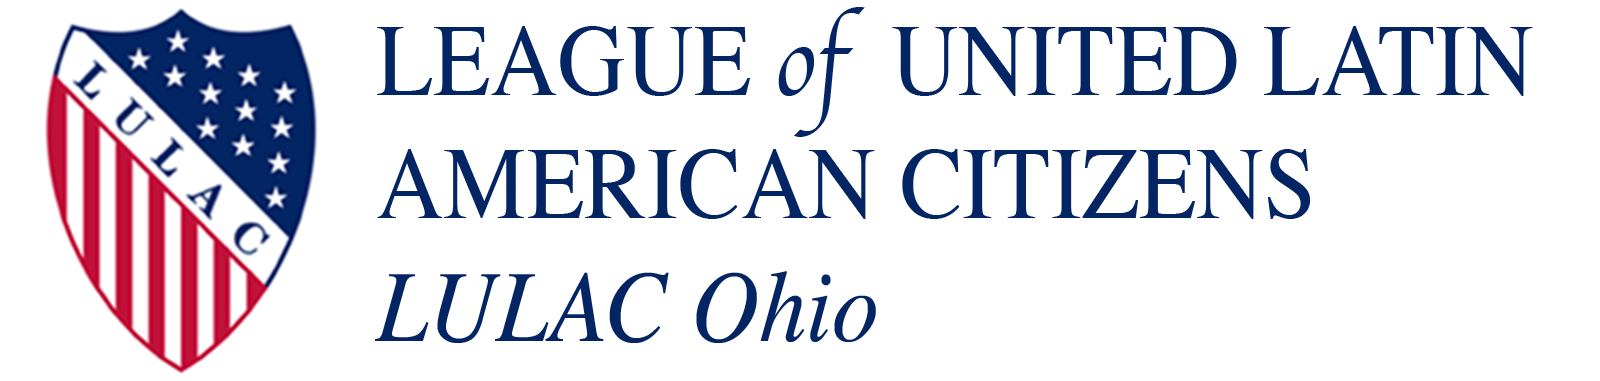 LULAC Ohio